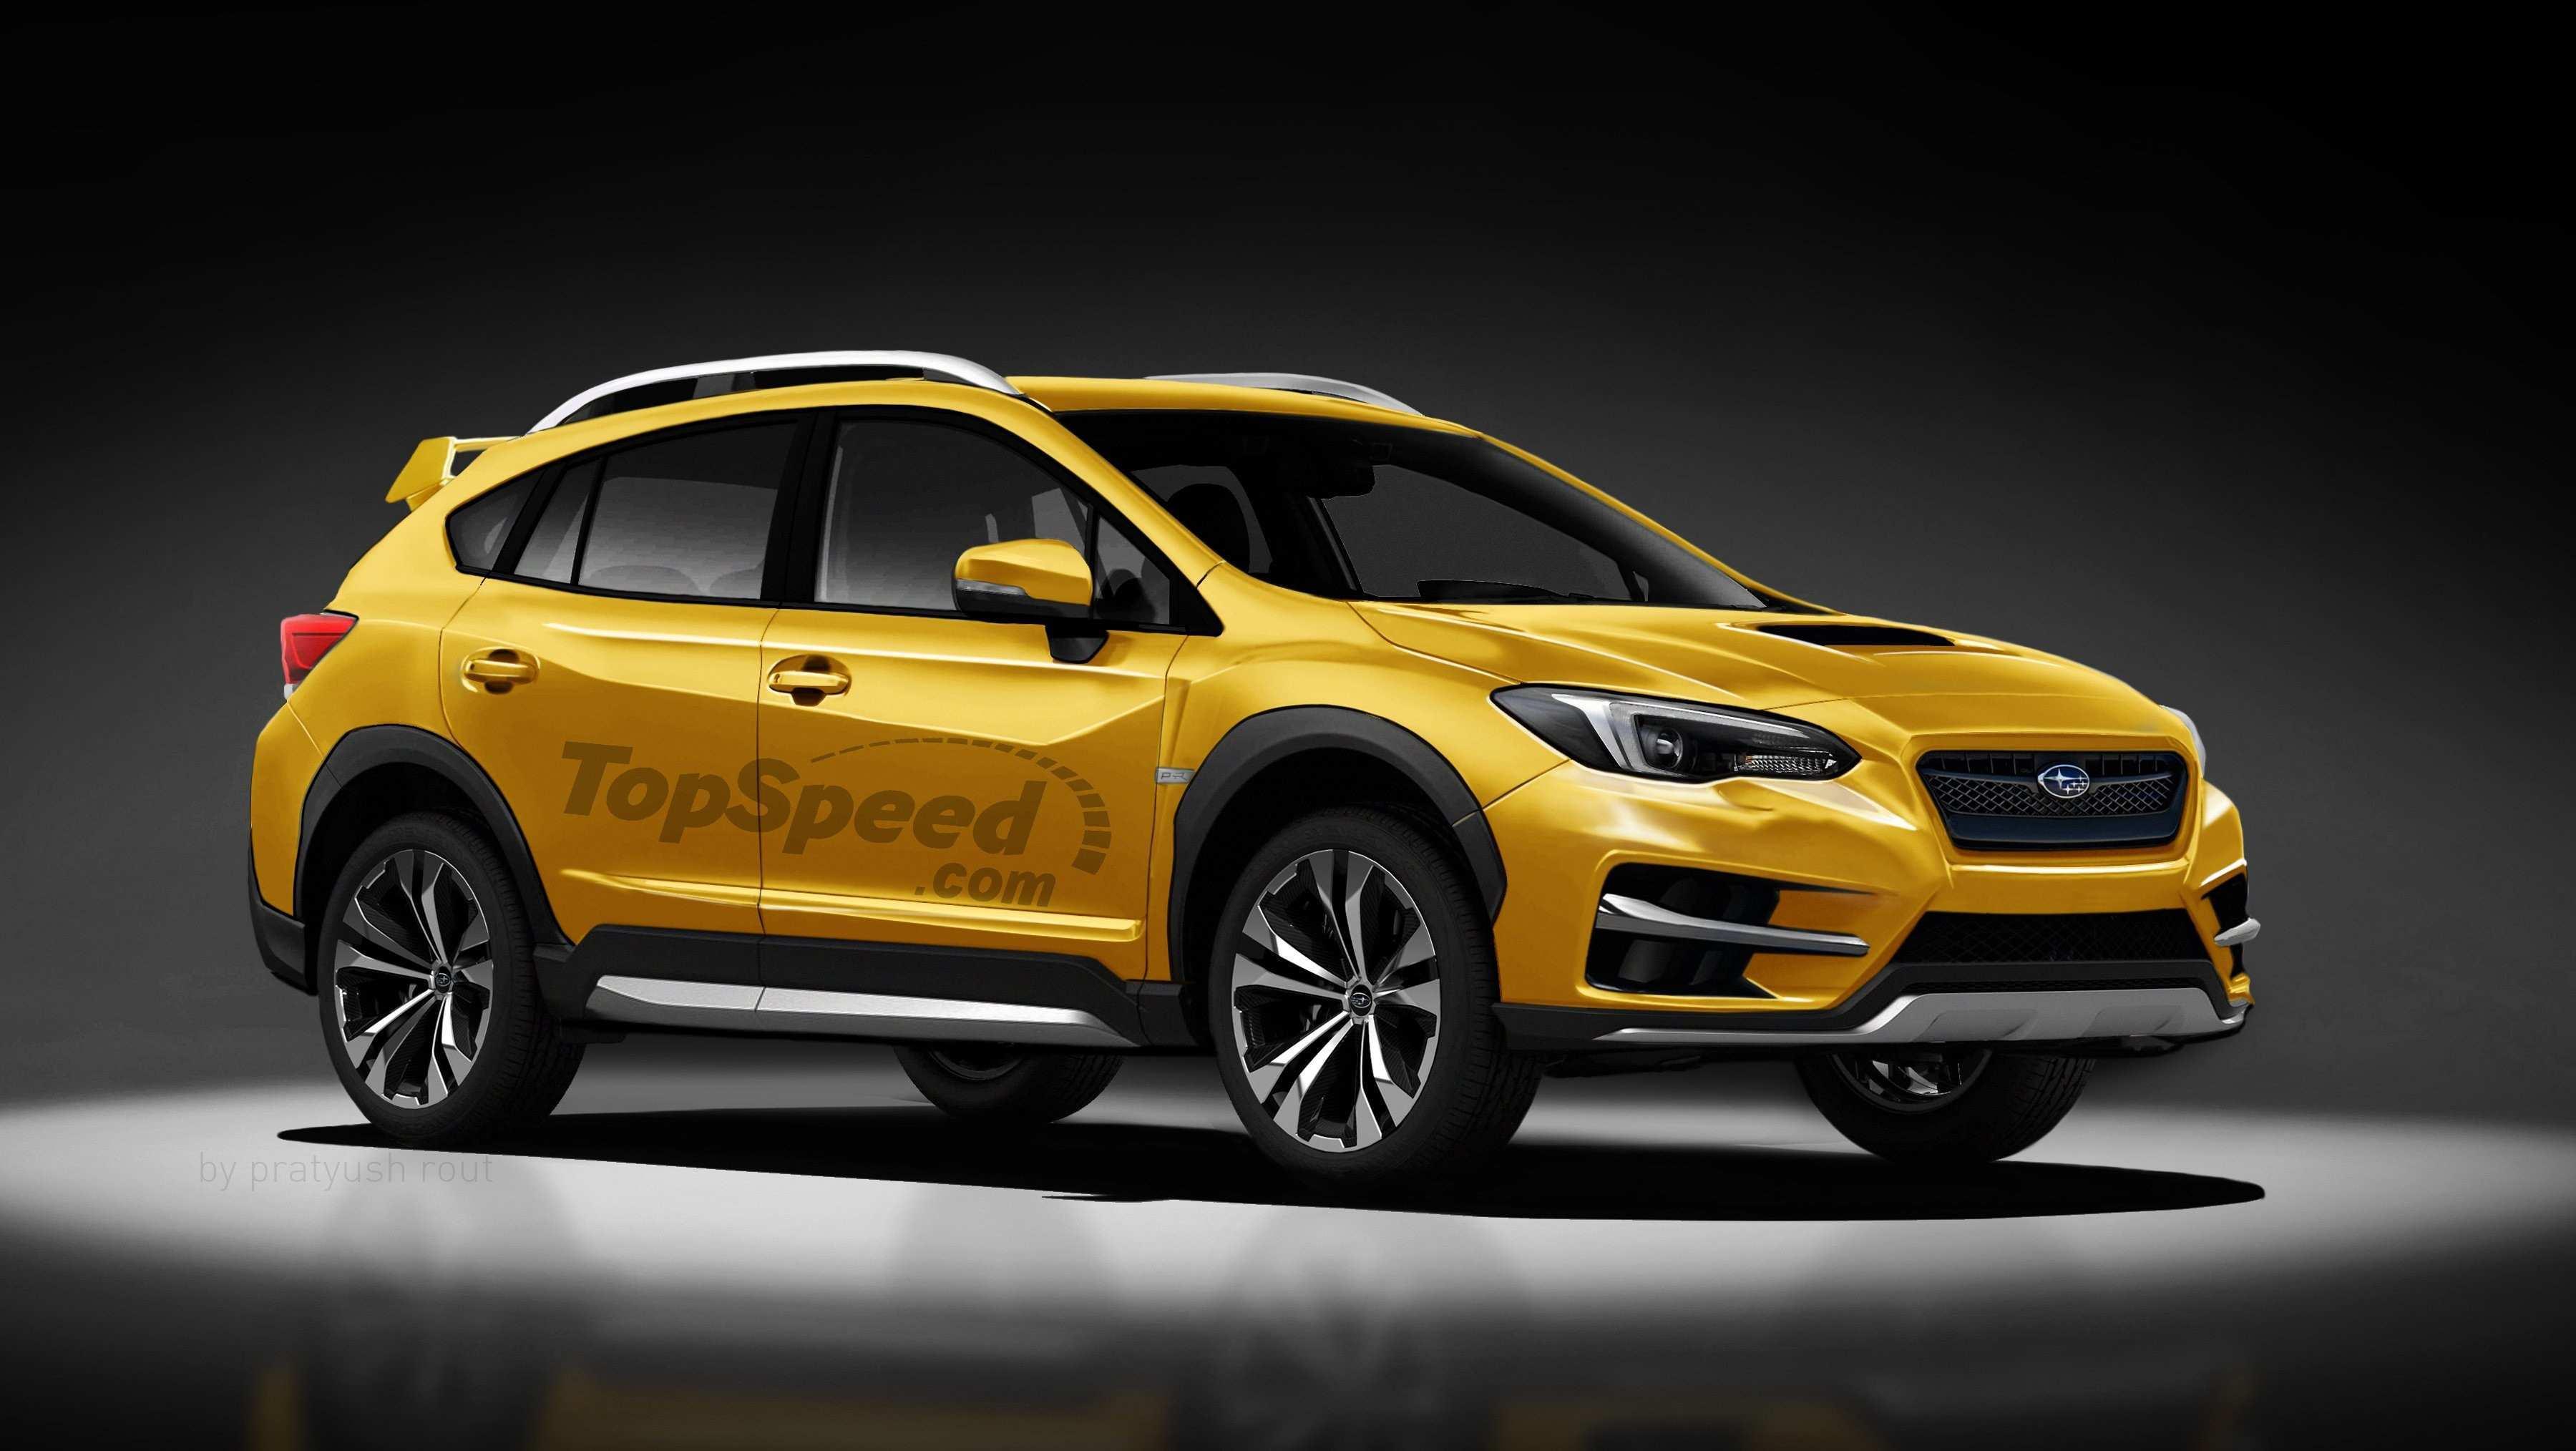 18 Concept of 2020 Subaru Crosstrek Hybridand Redesign for 2020 Subaru Crosstrek Hybridand